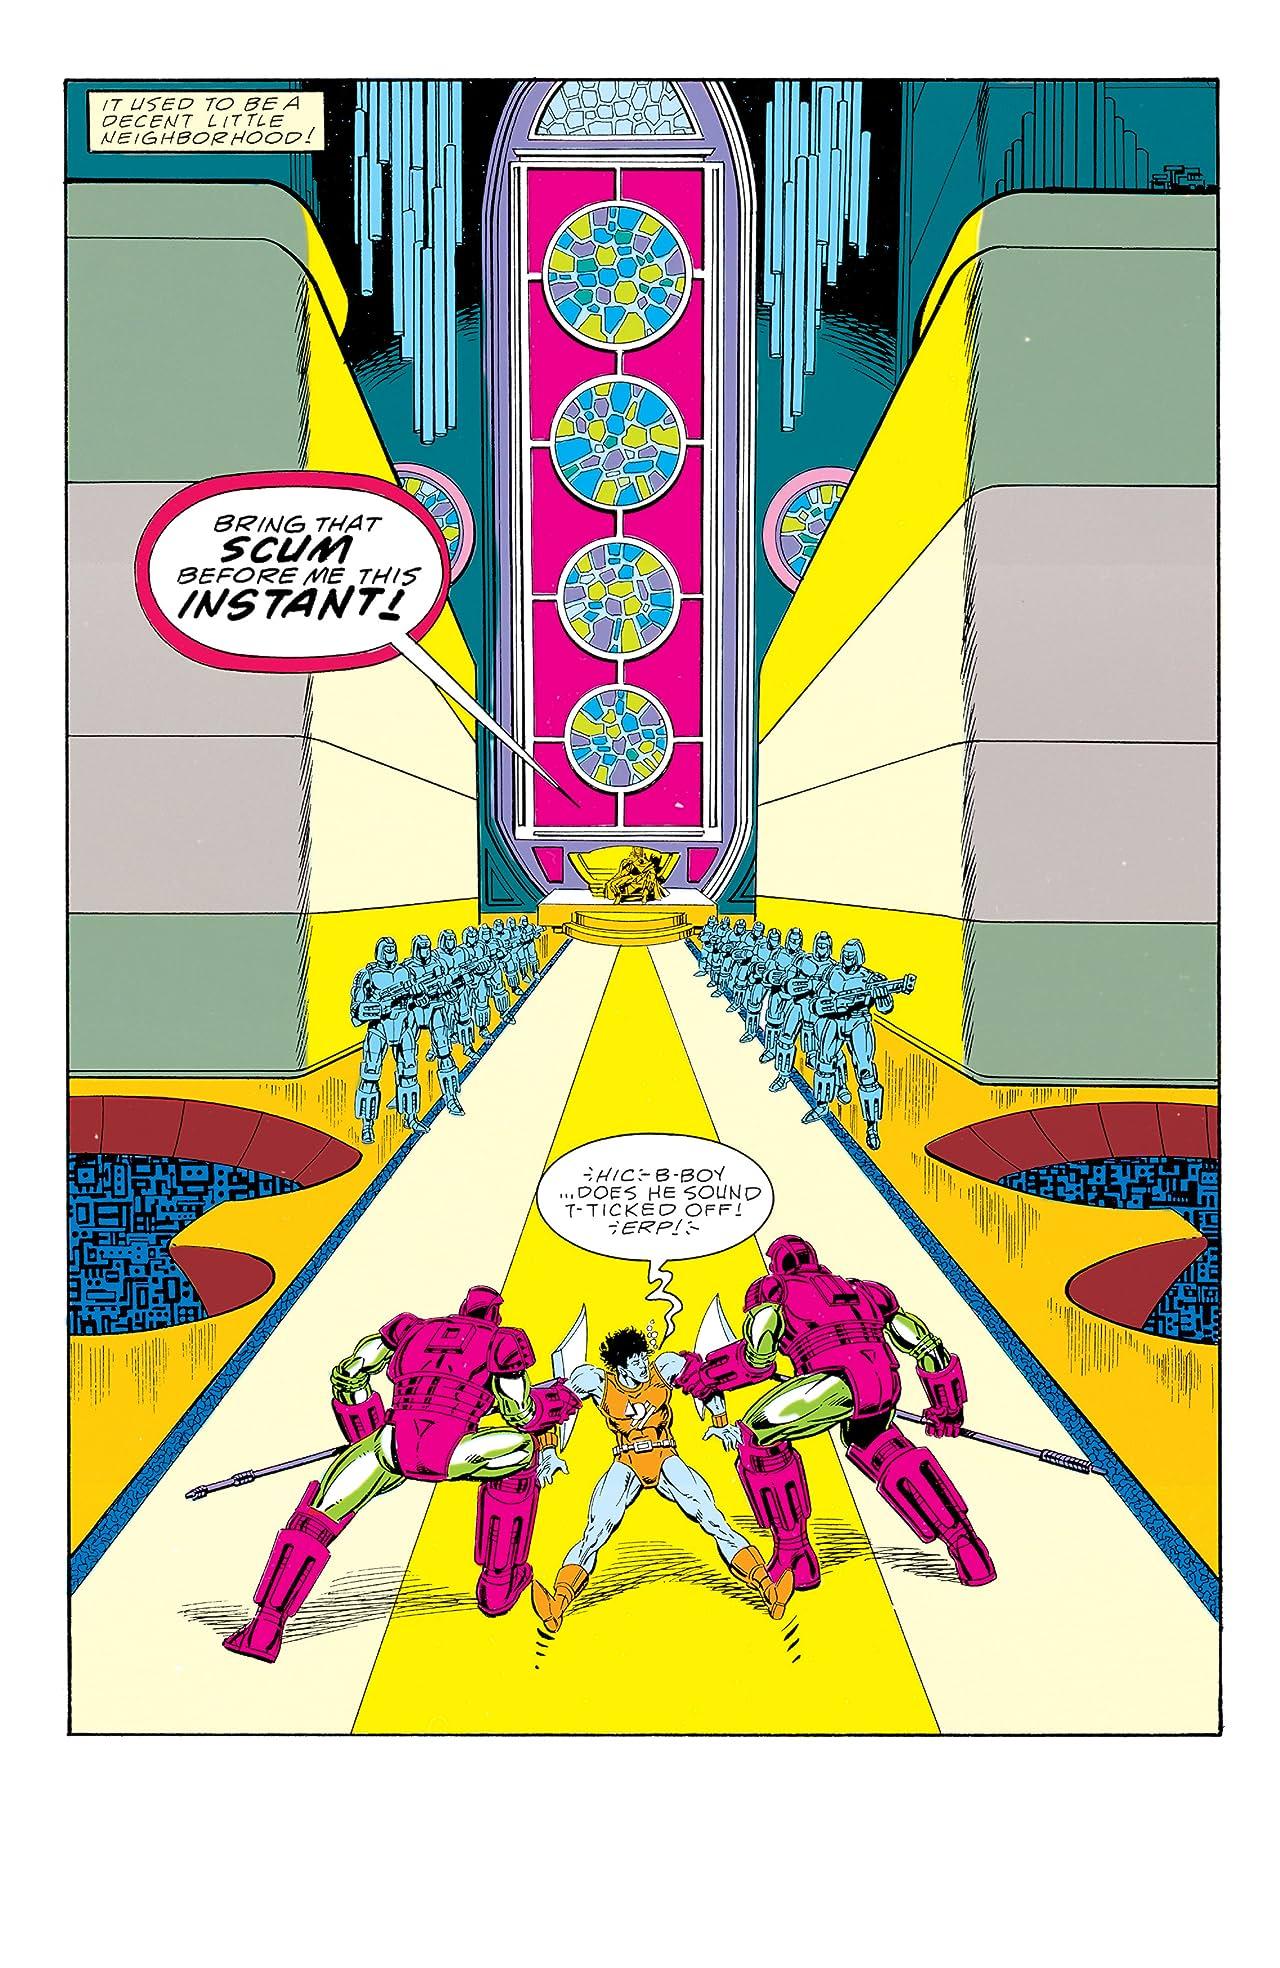 Marvel Graphic Novel #37: Hercules Prince of Power: Full Circle